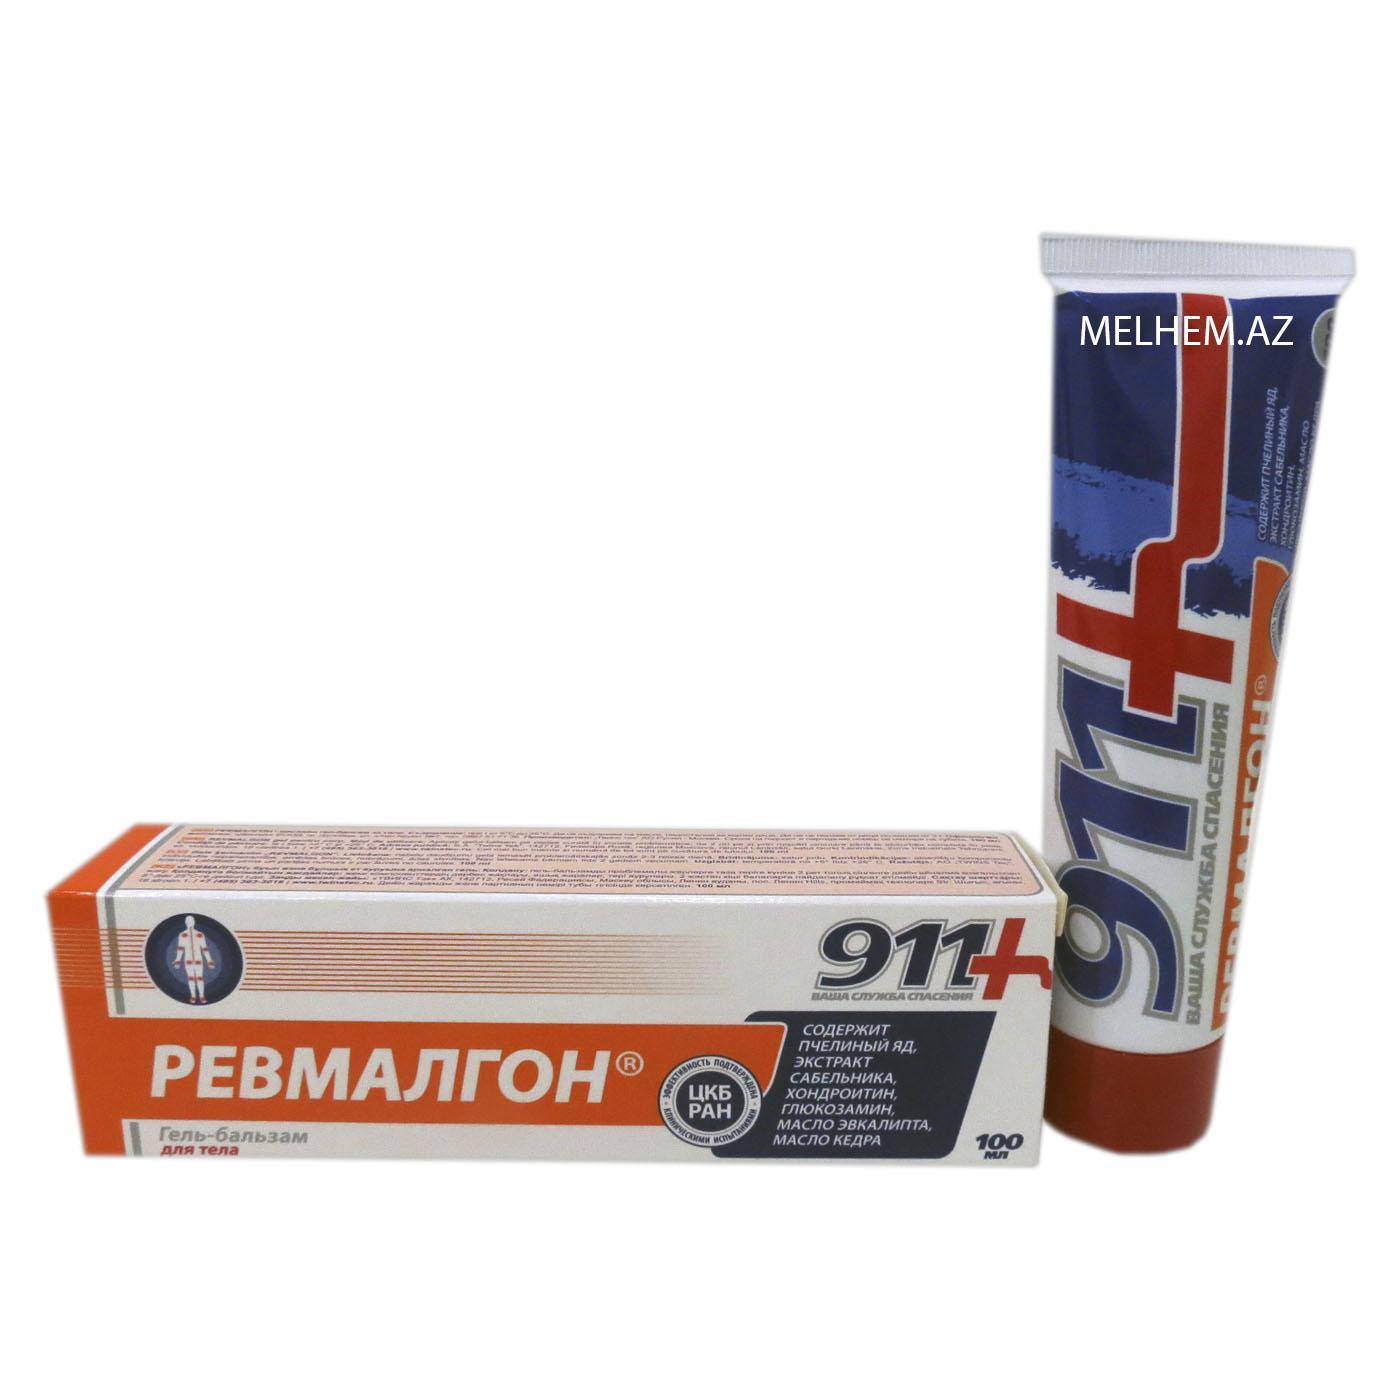 REVMALQON 911+